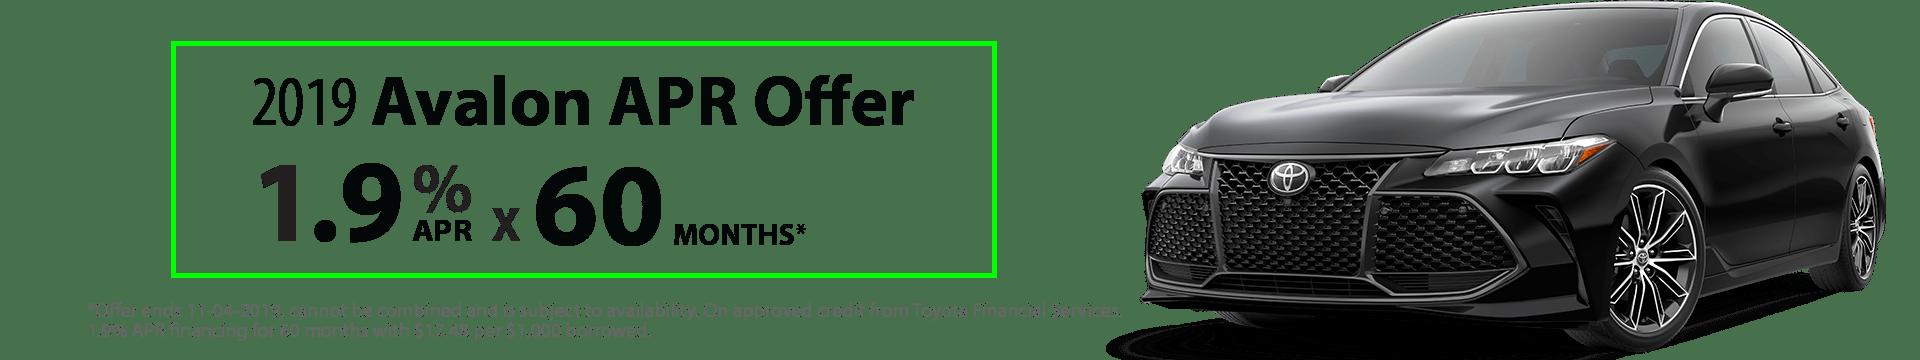 2019 Avalon 1.9% x 60 months Special Finance Offer